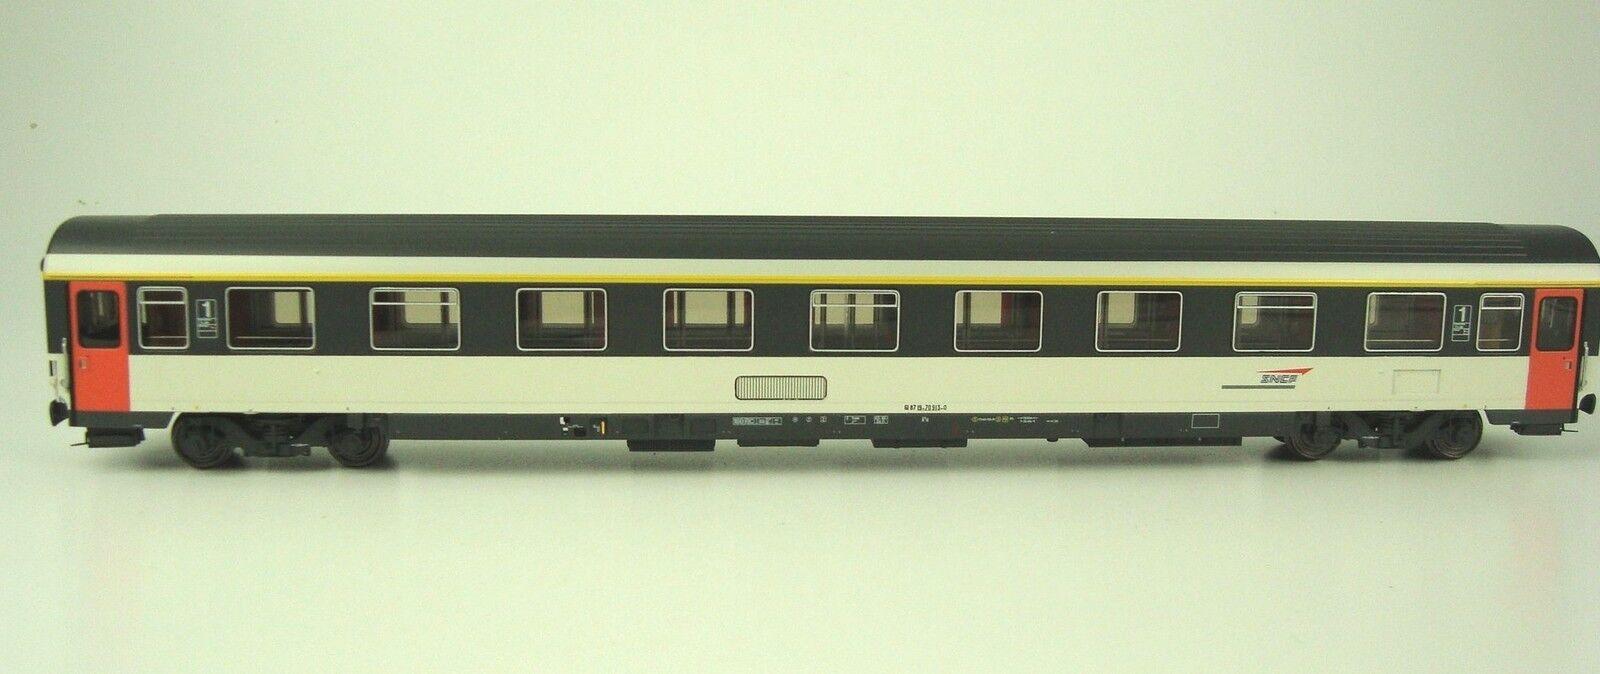 LS Models 40358 SNCF 1. KL. Eurofima Carriages A9u VSE Corail Grey Orang Ep4 NEW + OVP